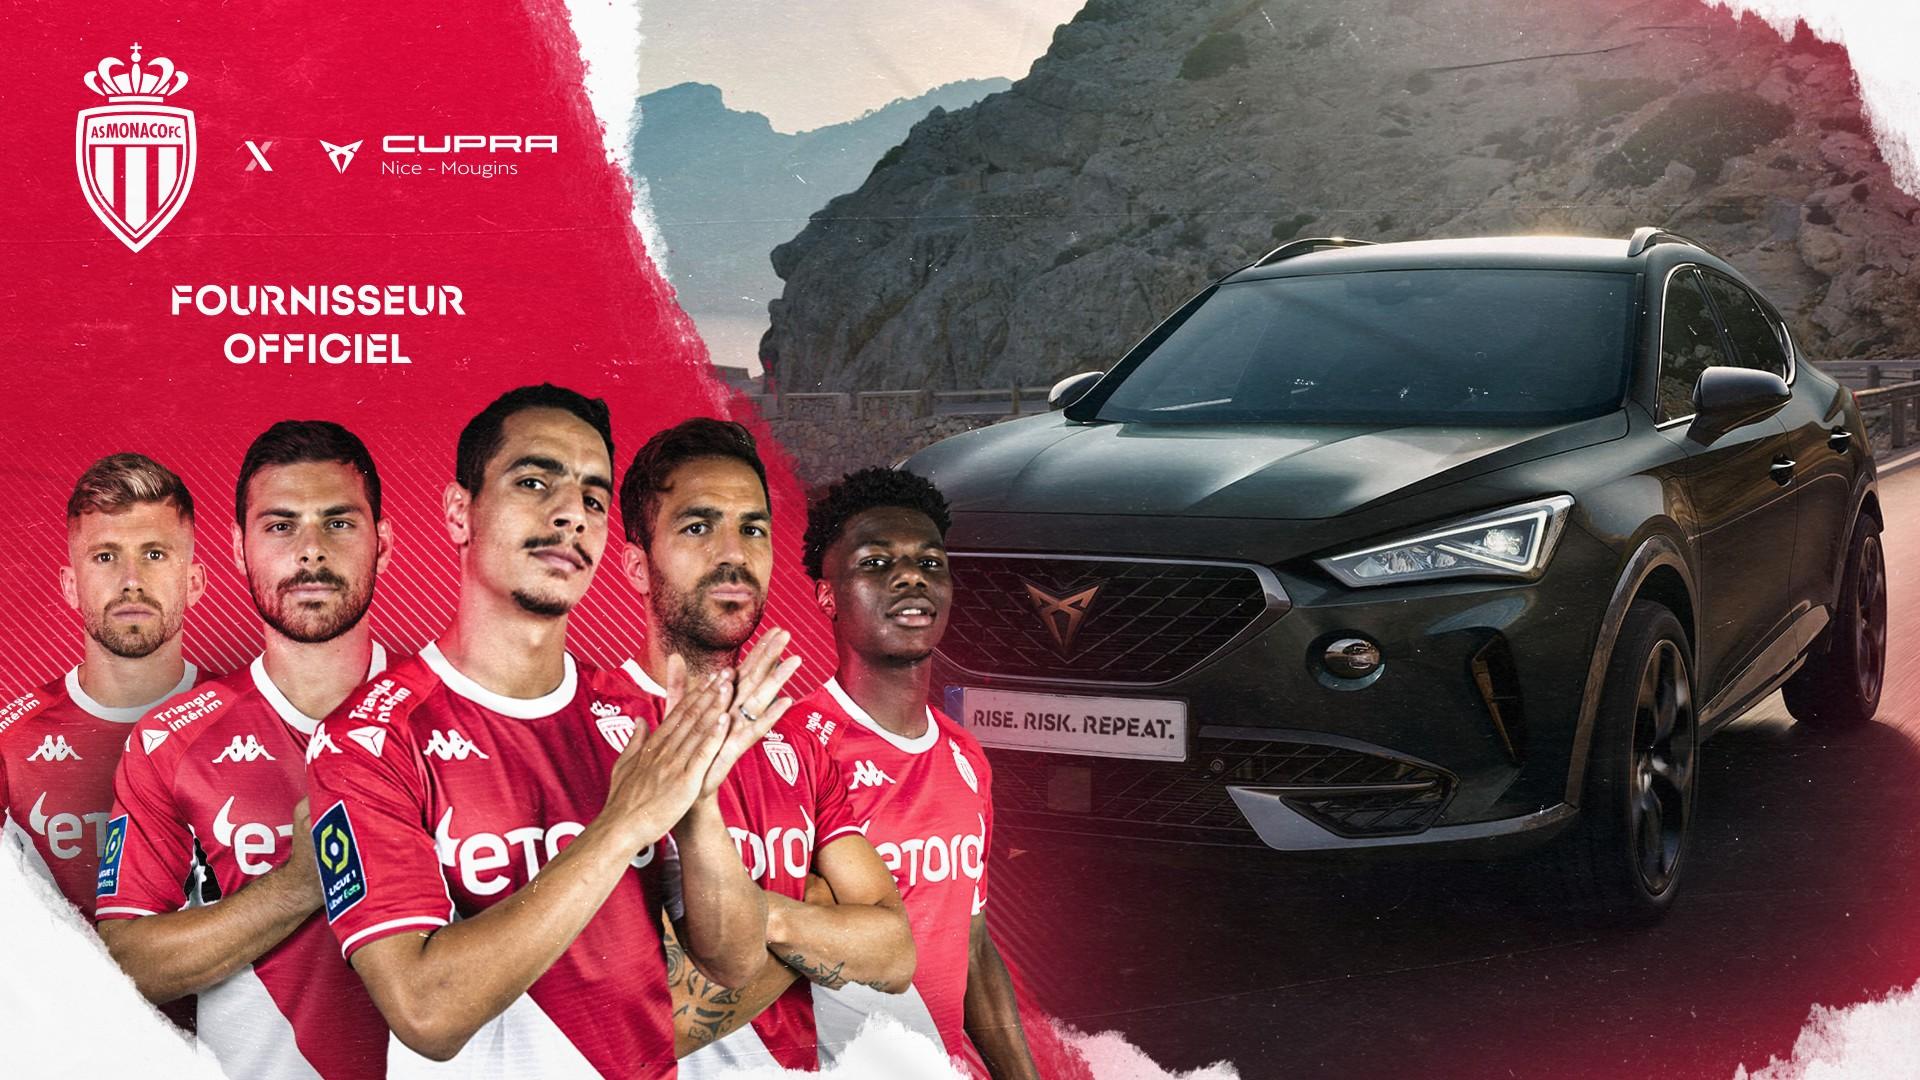 Cupra x AS Monaco (football) 2021